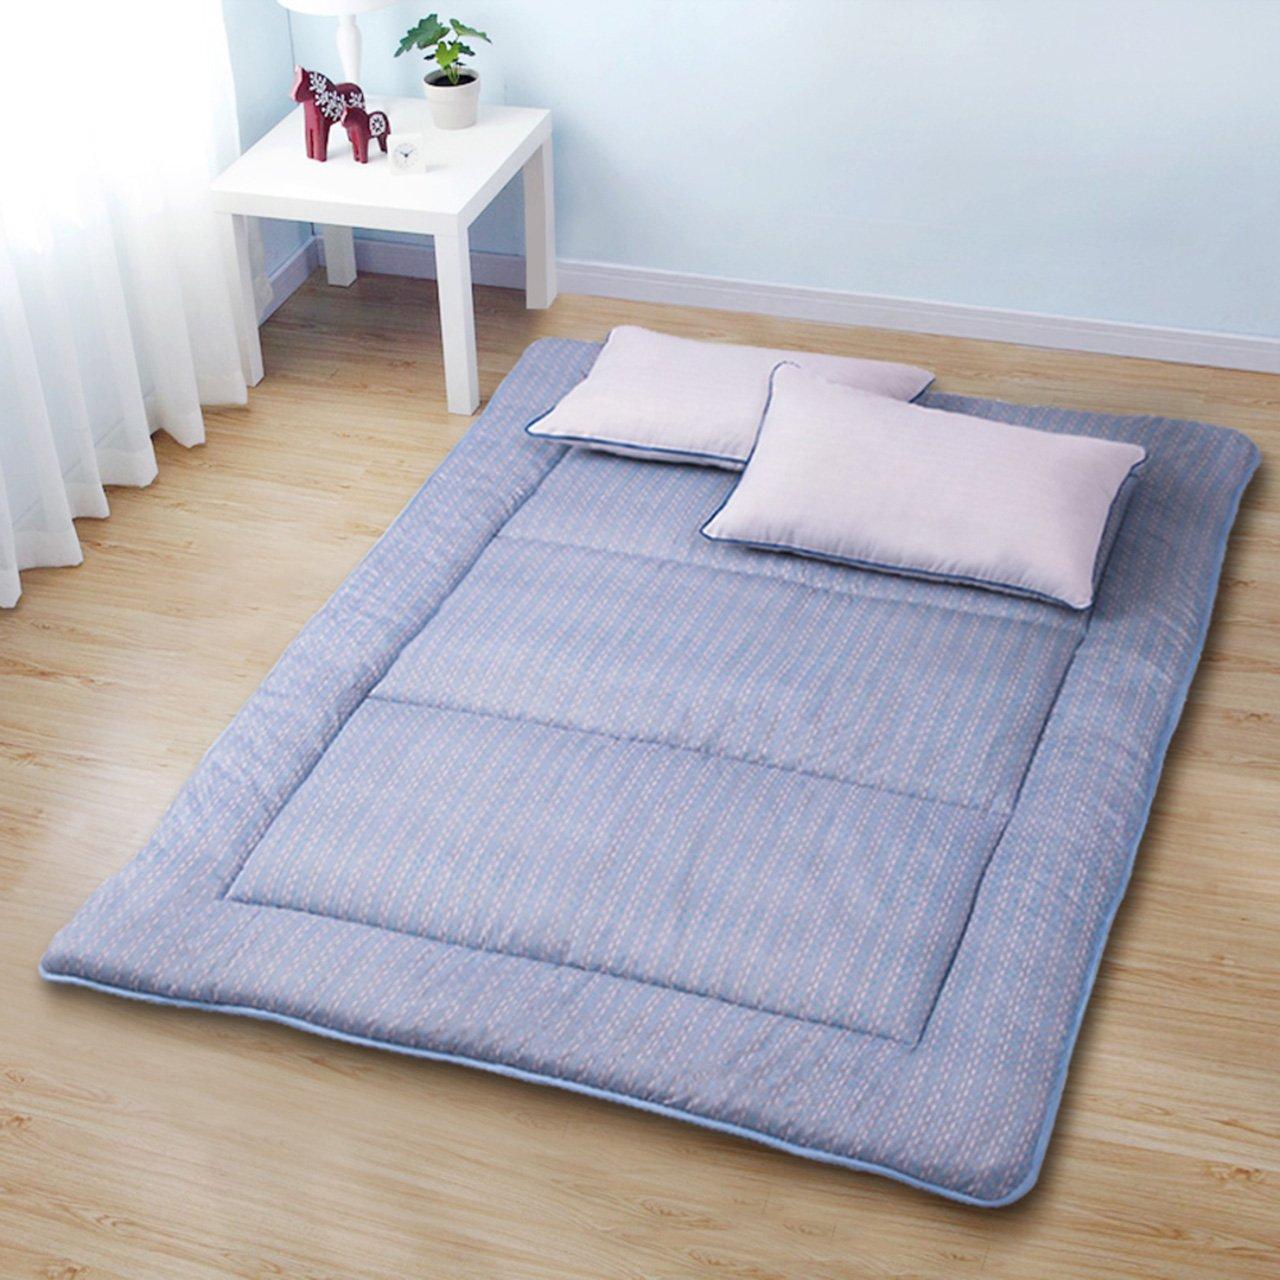 Yellow star Foldable futon mattress topper, Non-slip tatami floor mat dorm single size futon mattress topper portable sleeping pad-A 100x195cm(39x77inch)